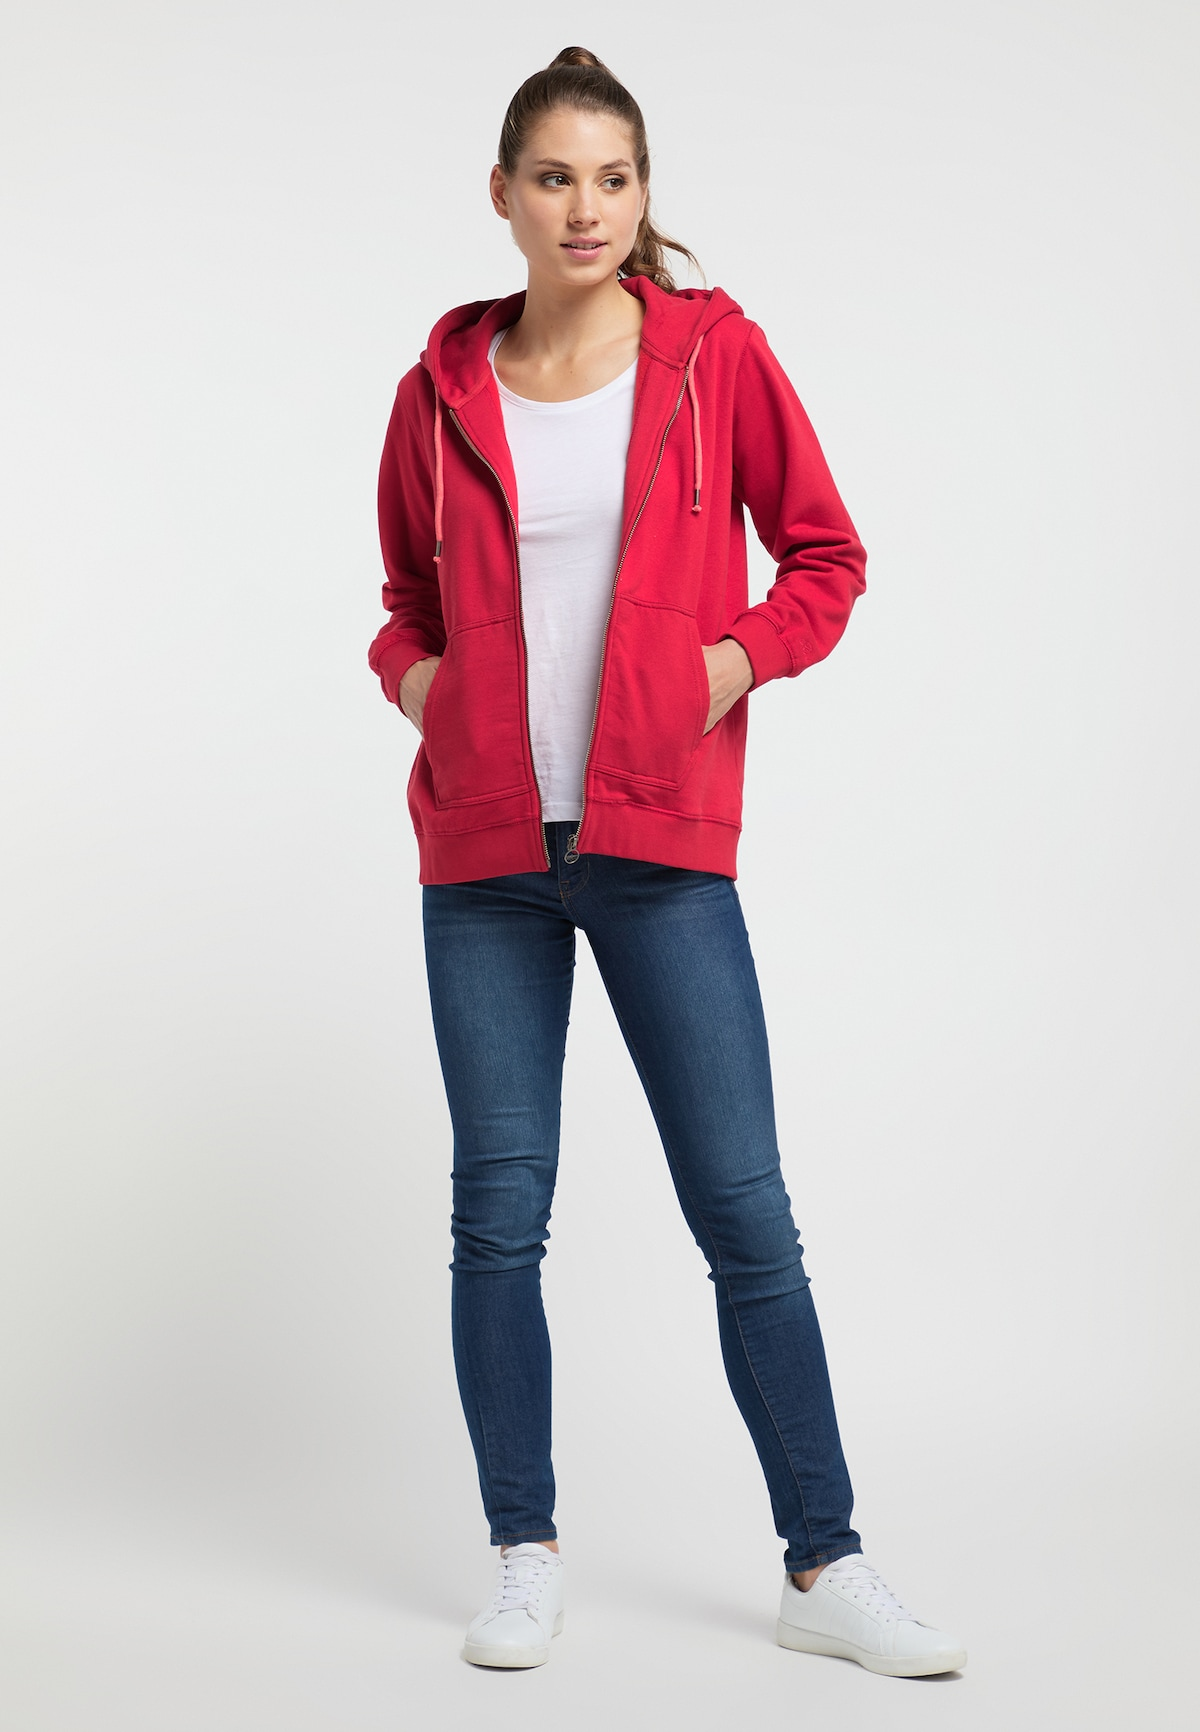 Beliebt Frauen Bekleidung Petrol Industries Petrol Industries WOMEN Sweatjacke in rot Zum Verkauf